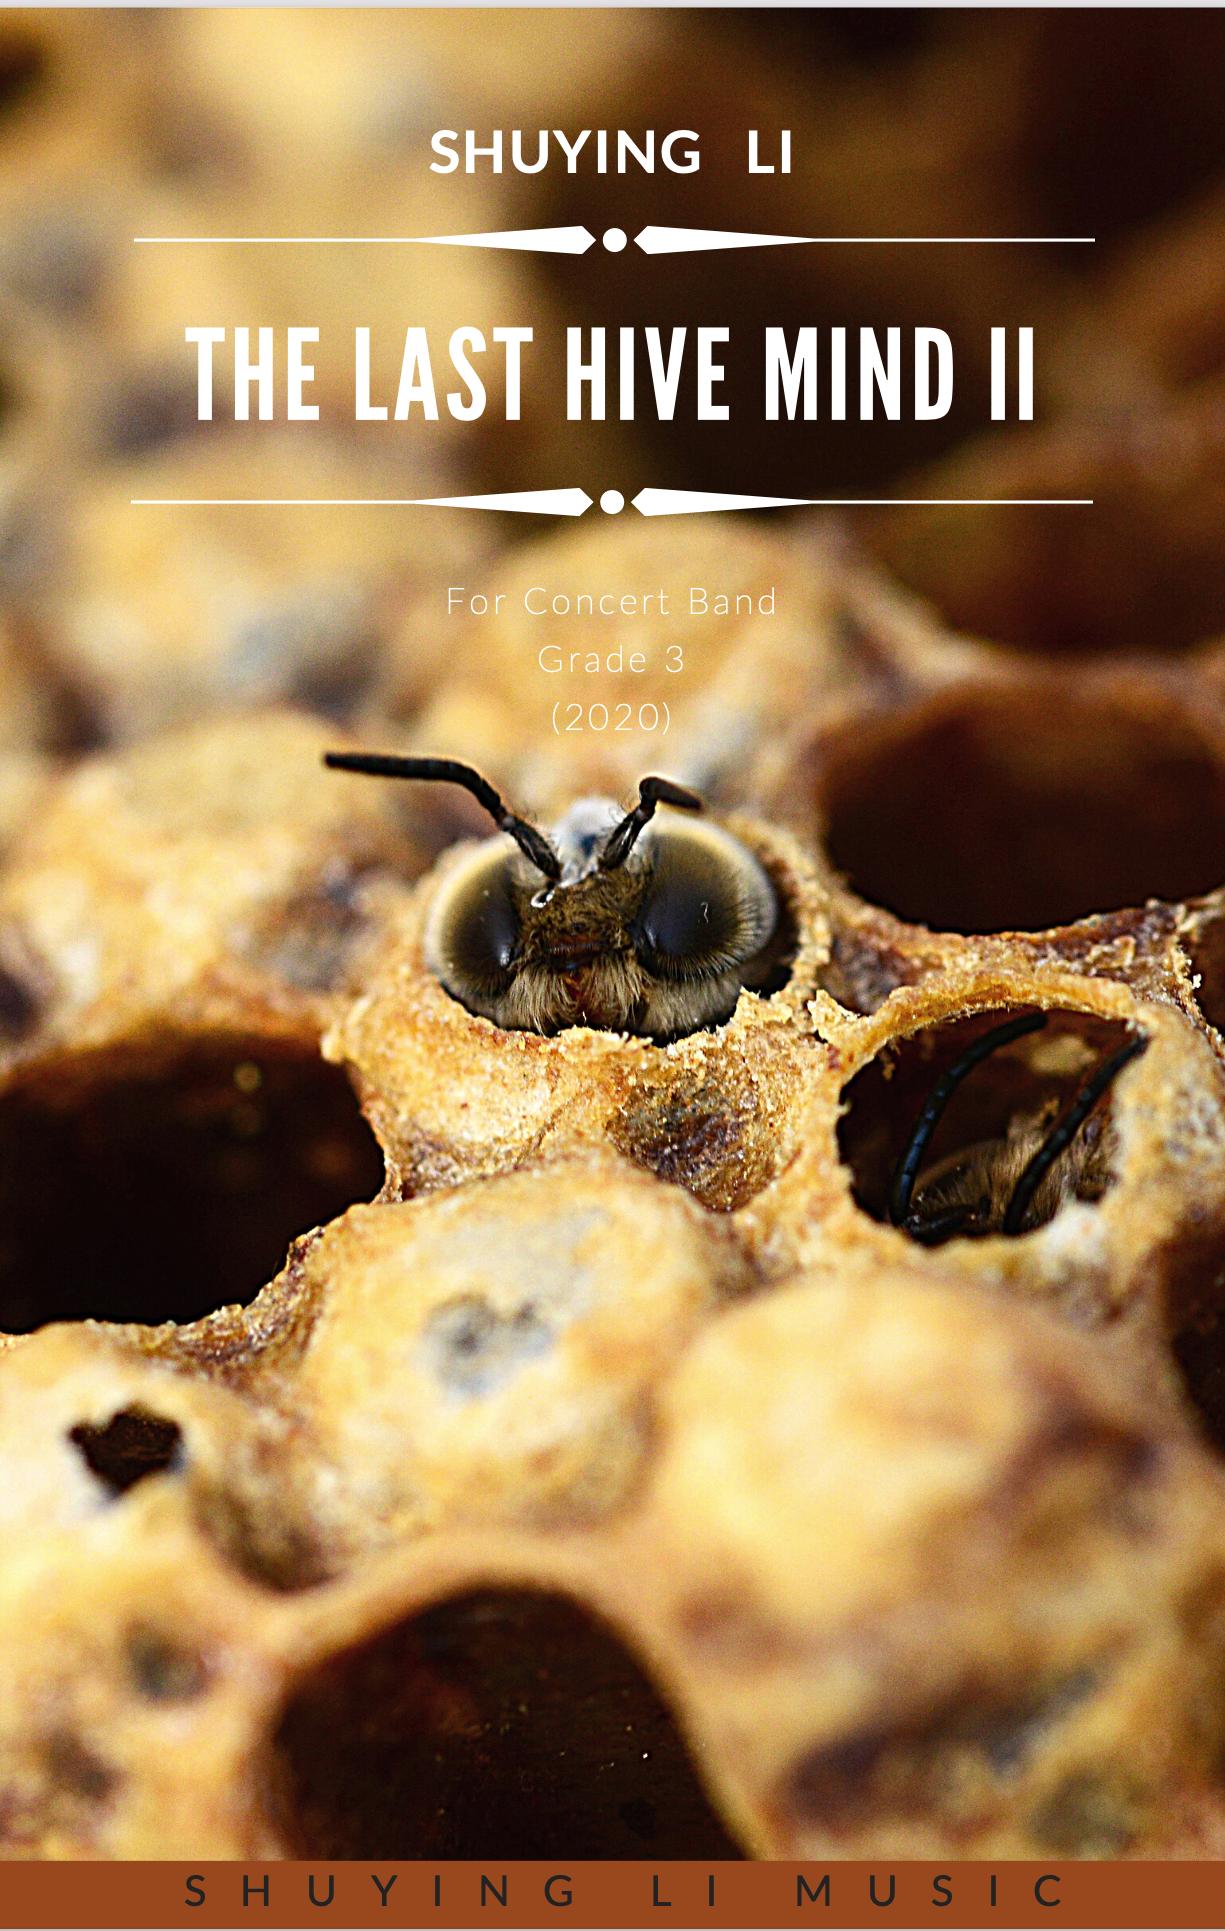 The Last Hivemind II by Shuying Li